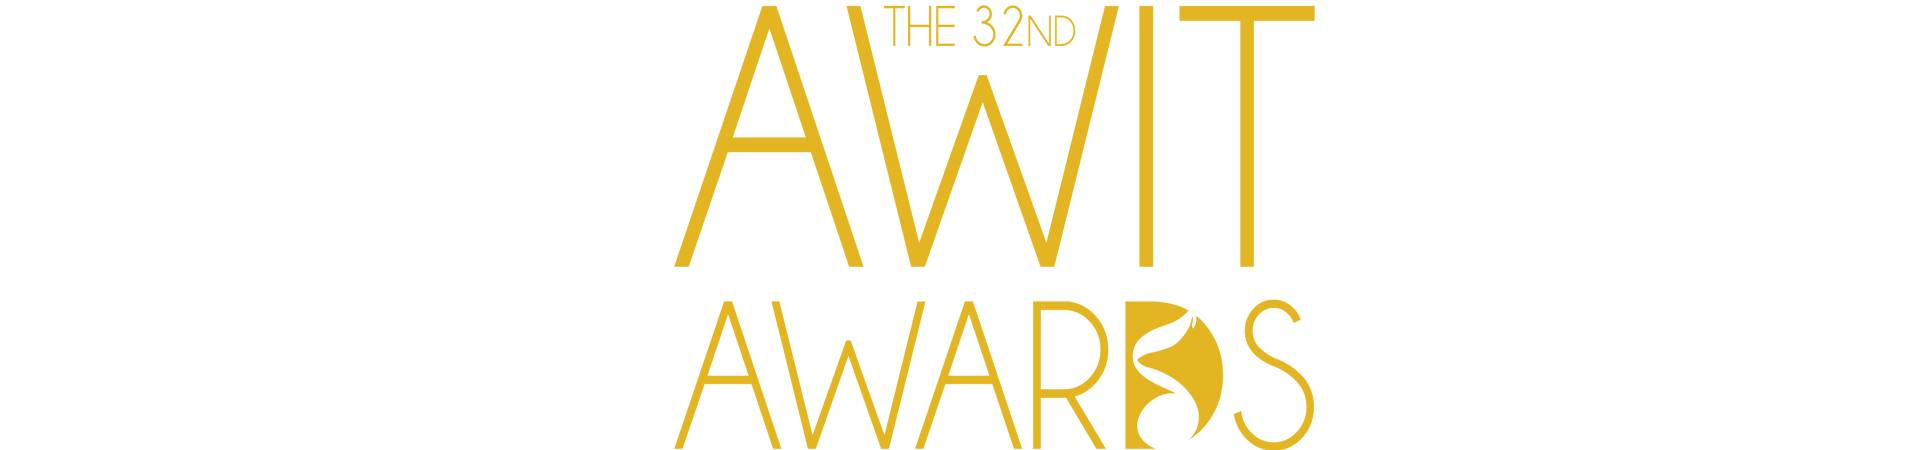 32nd Awit Awards Favorite Female Artist